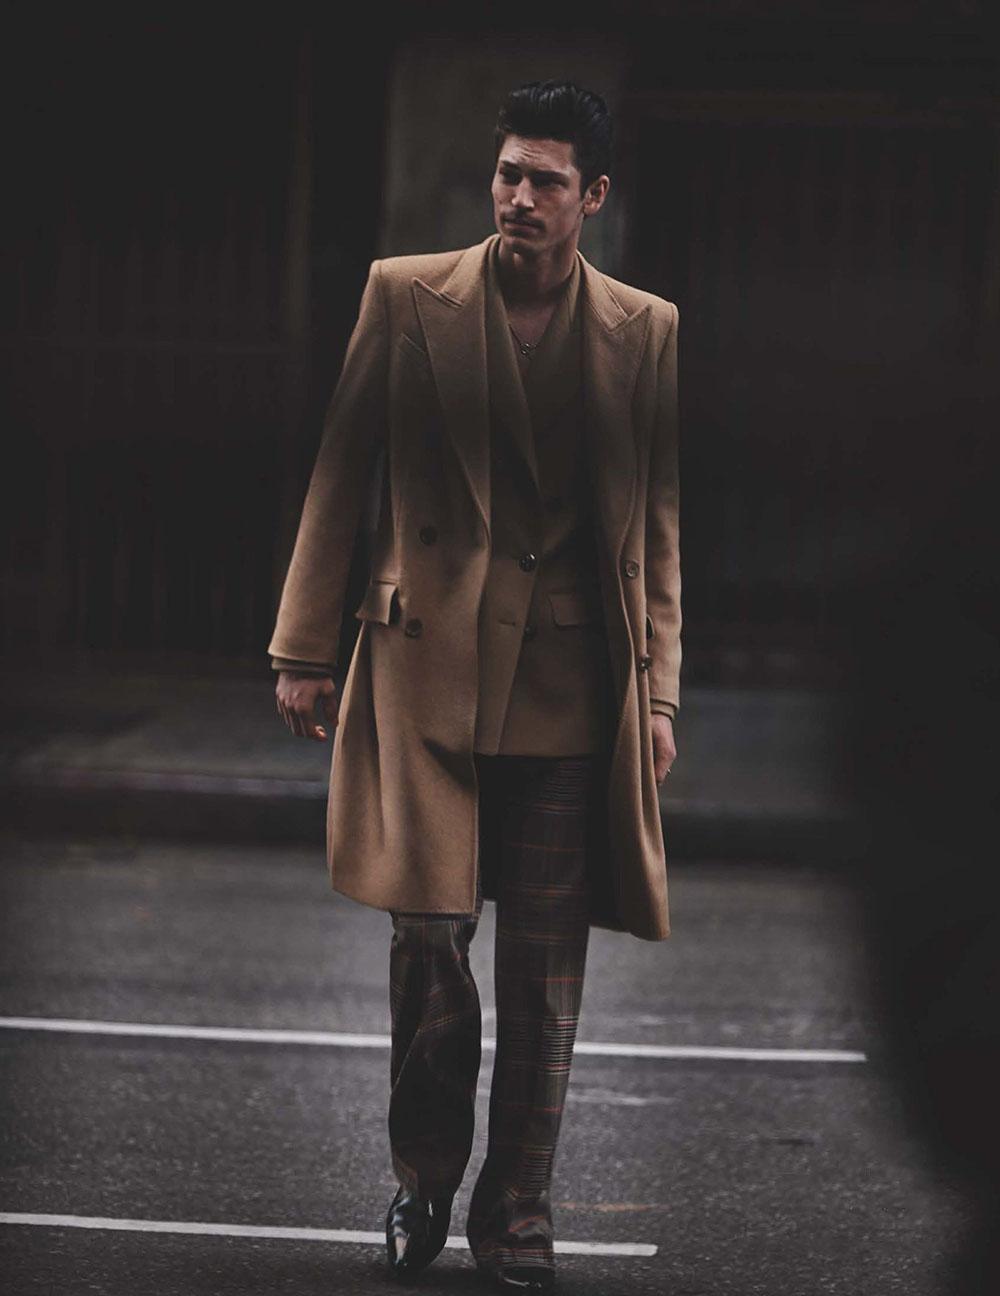 Justin Eric Martin by Blair Getz Mezibov for British GQ November 2019